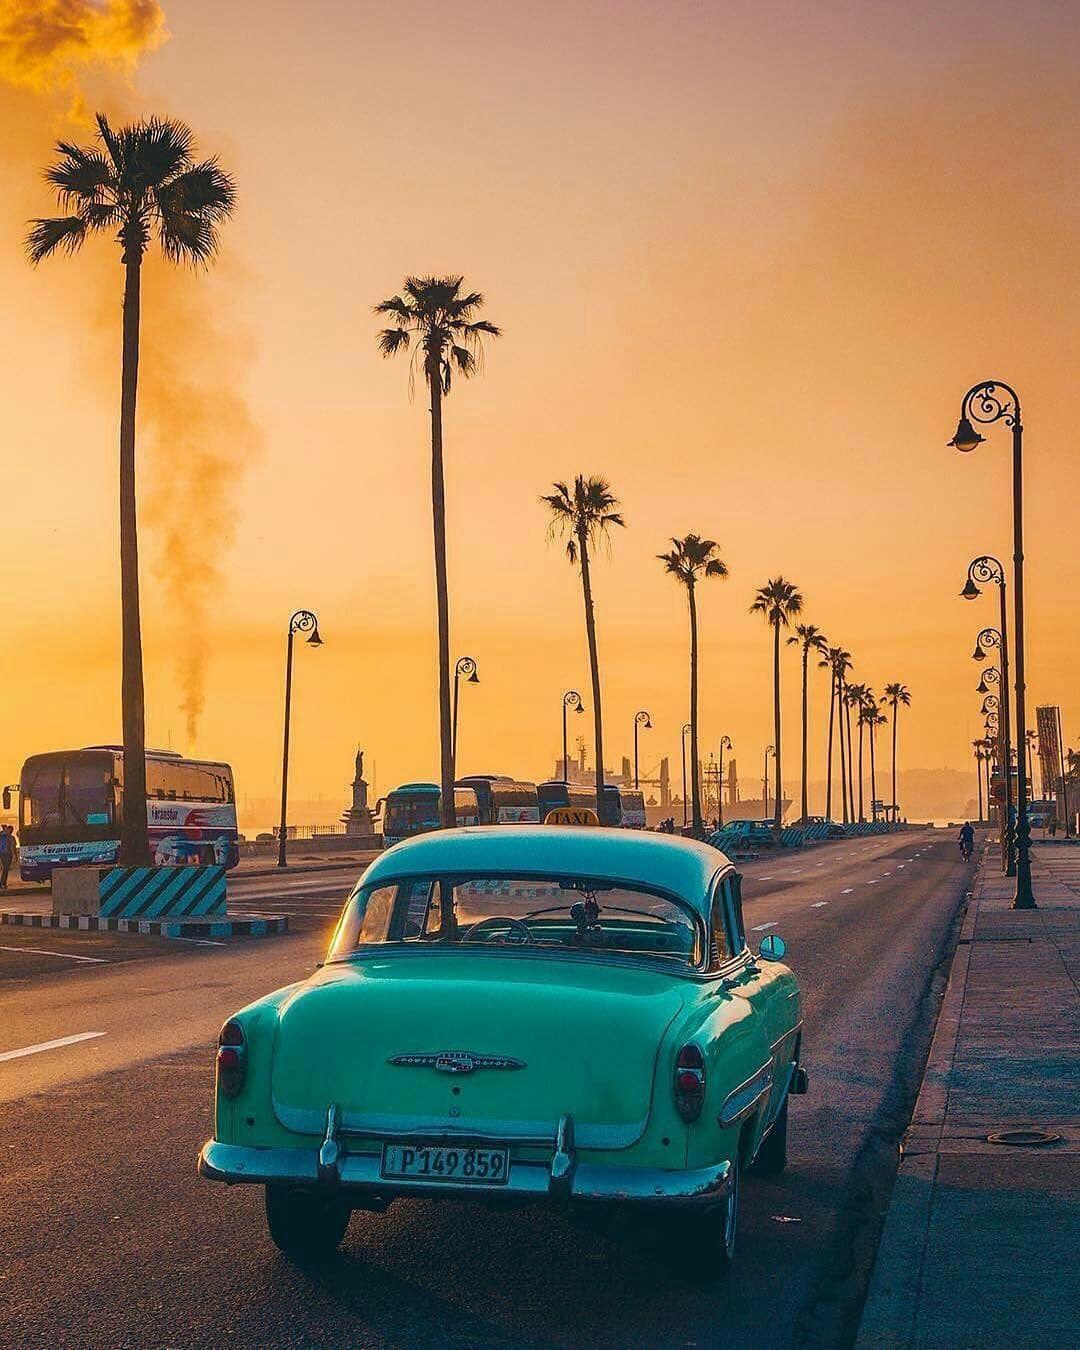 Photo of Havana By ΛLBOΓЯΛVΞL